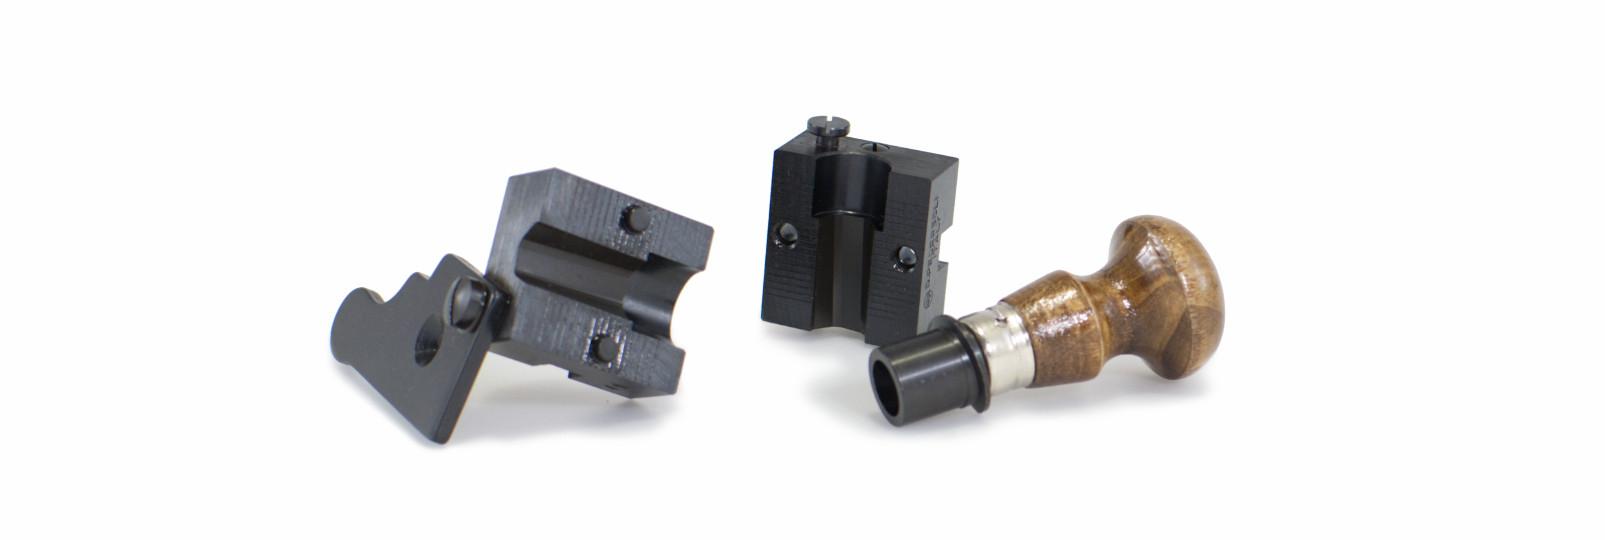 Bullet mould block with 1 cavity - hexagonal bullet